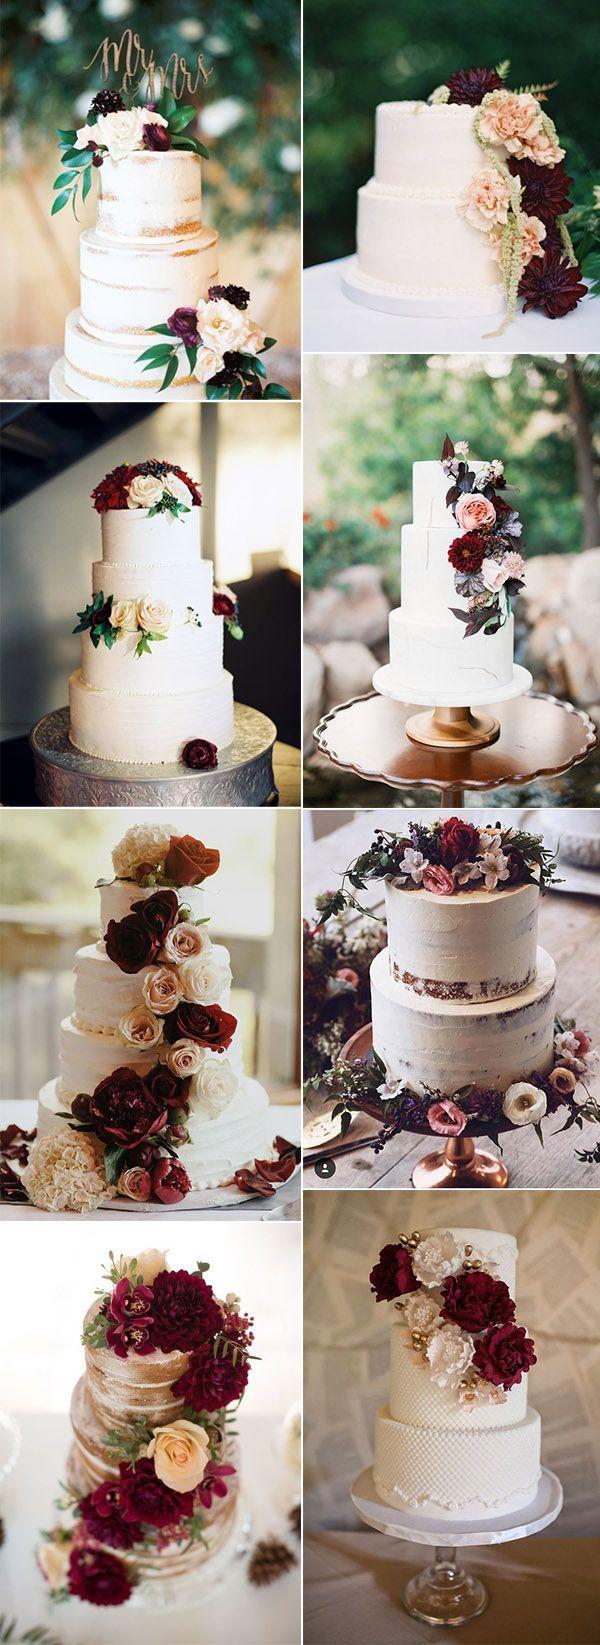 Wedding decorations for church december 2018  best Burgundy wedding flowers images on Pinterest  Wedding